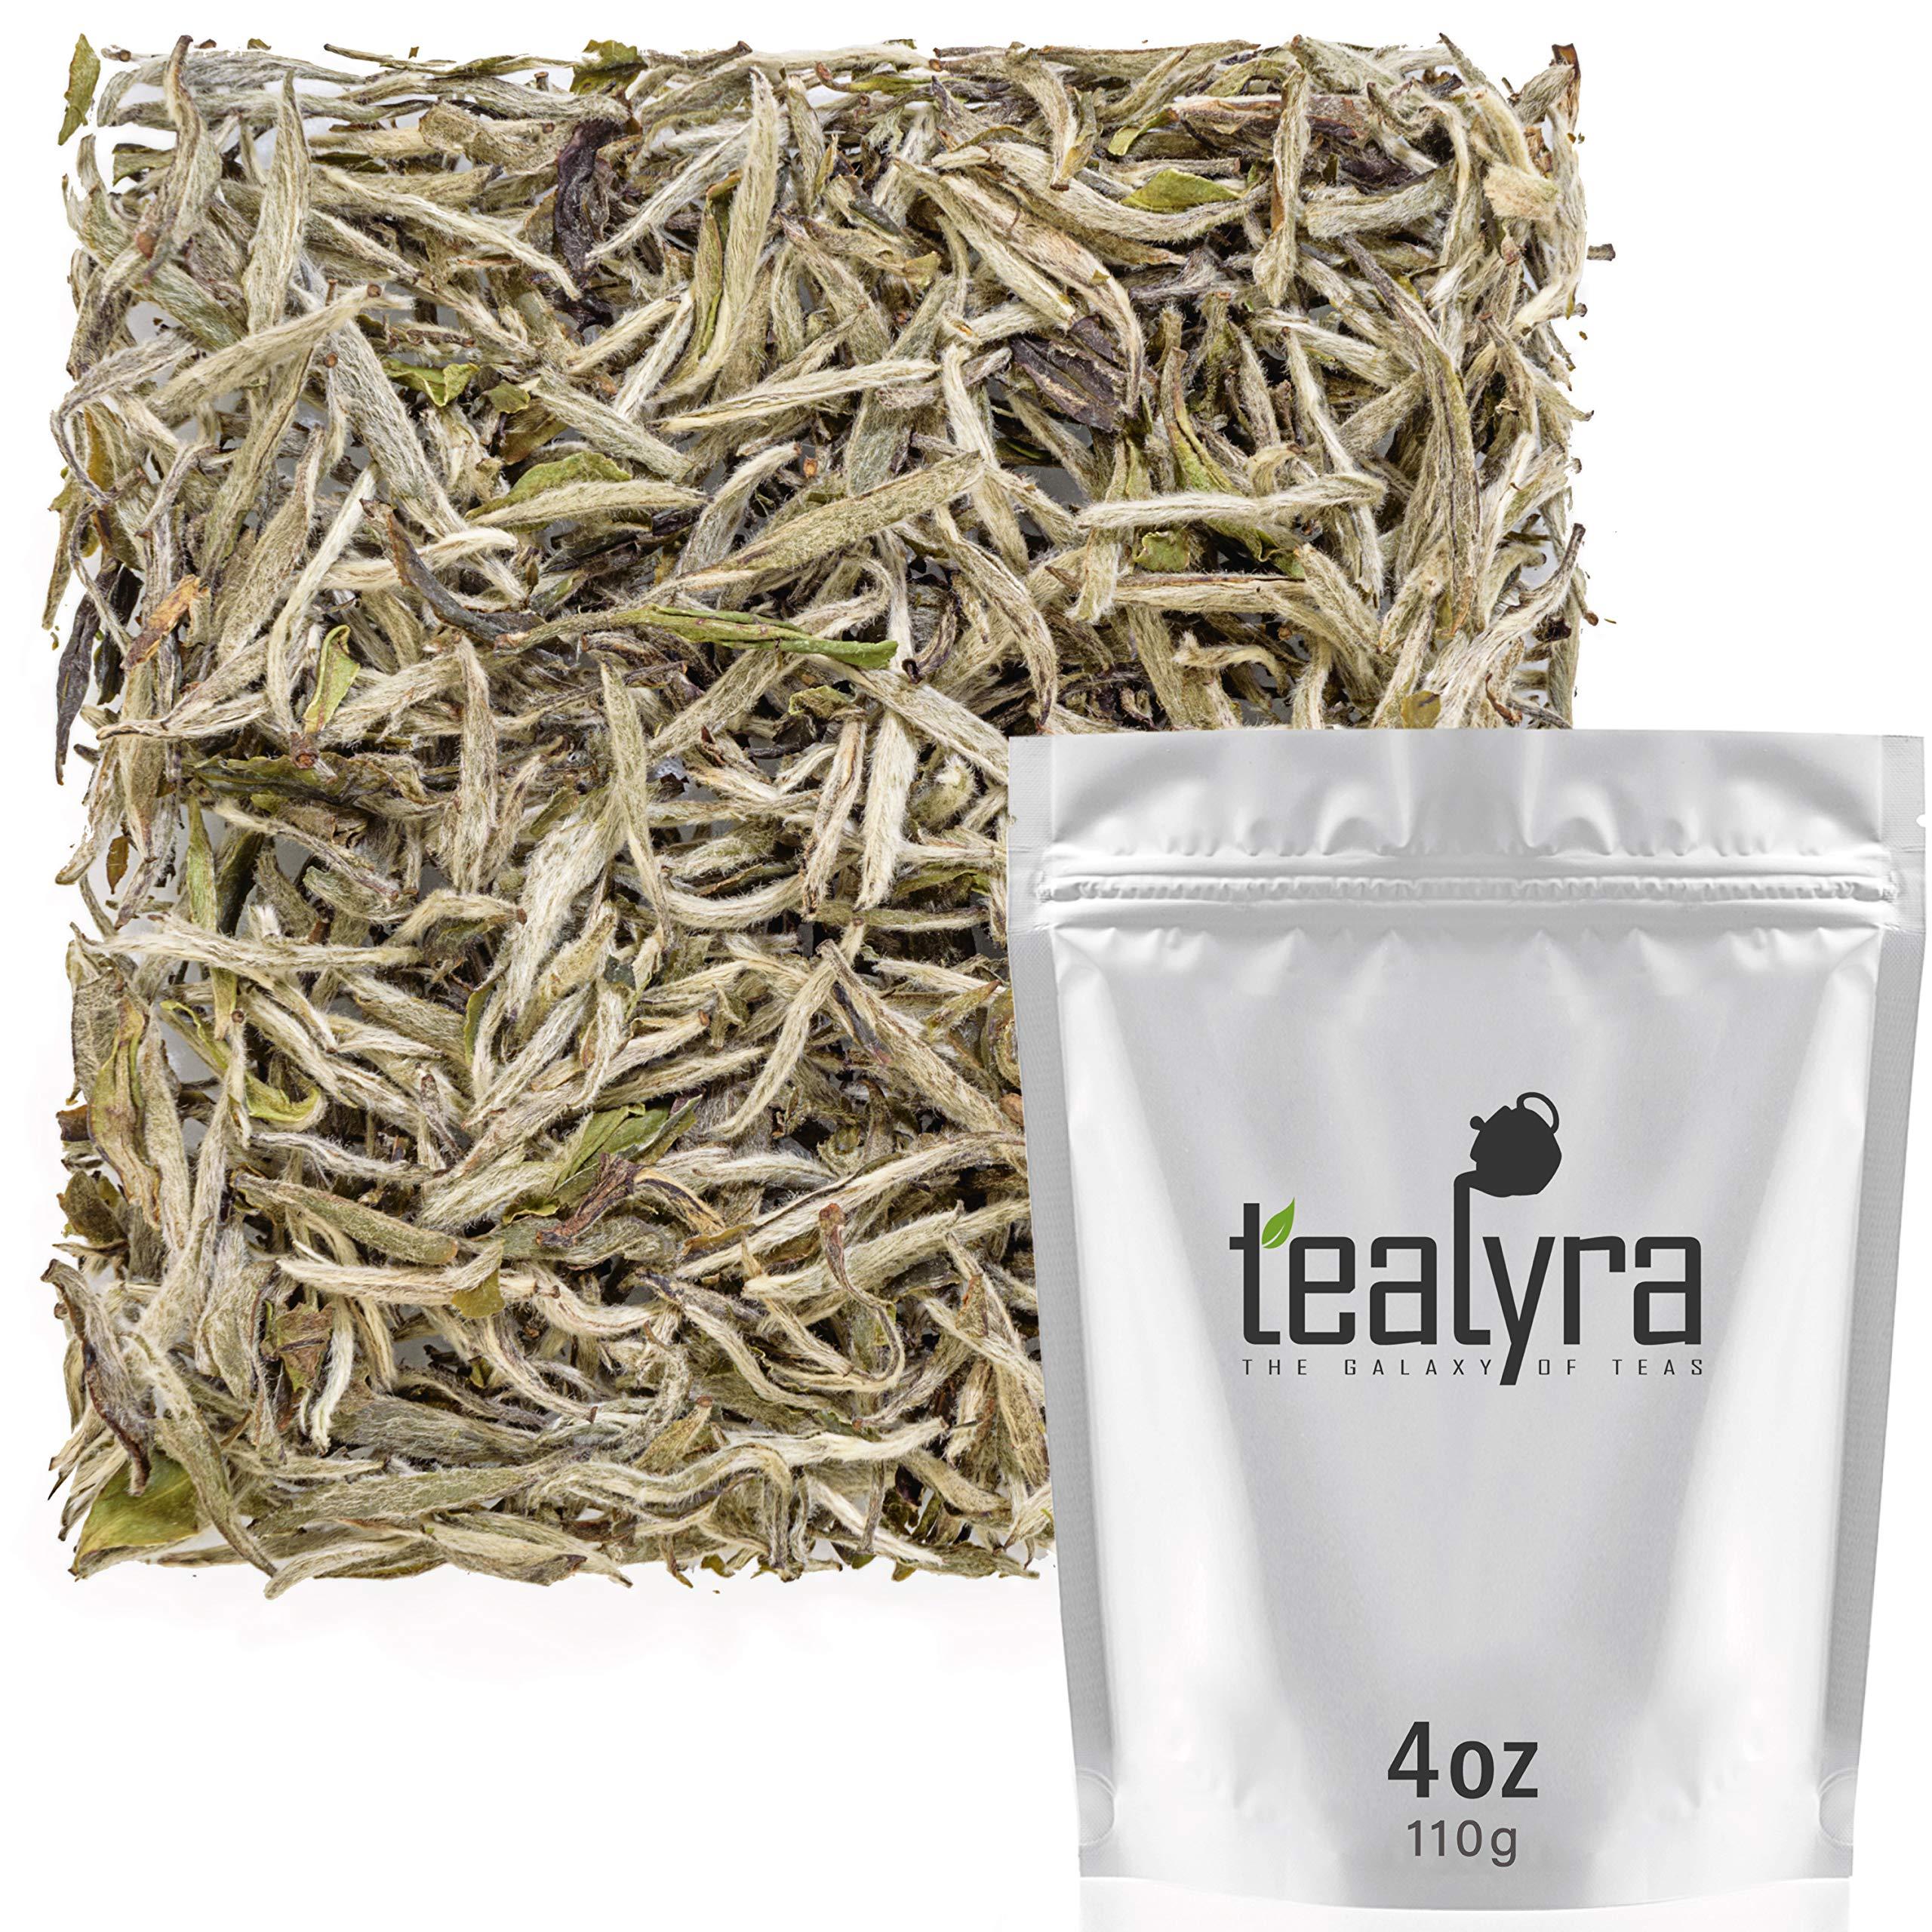 Tealyra - Superfine Silver Needle - Bai Hao Yin Zhen - White Tea Loose Leaf Tea - Highest grade of Best Chinese White Tea Leaves - Organically Grown in Fujian - Caffeine Level Low - 110g (4-ounce)